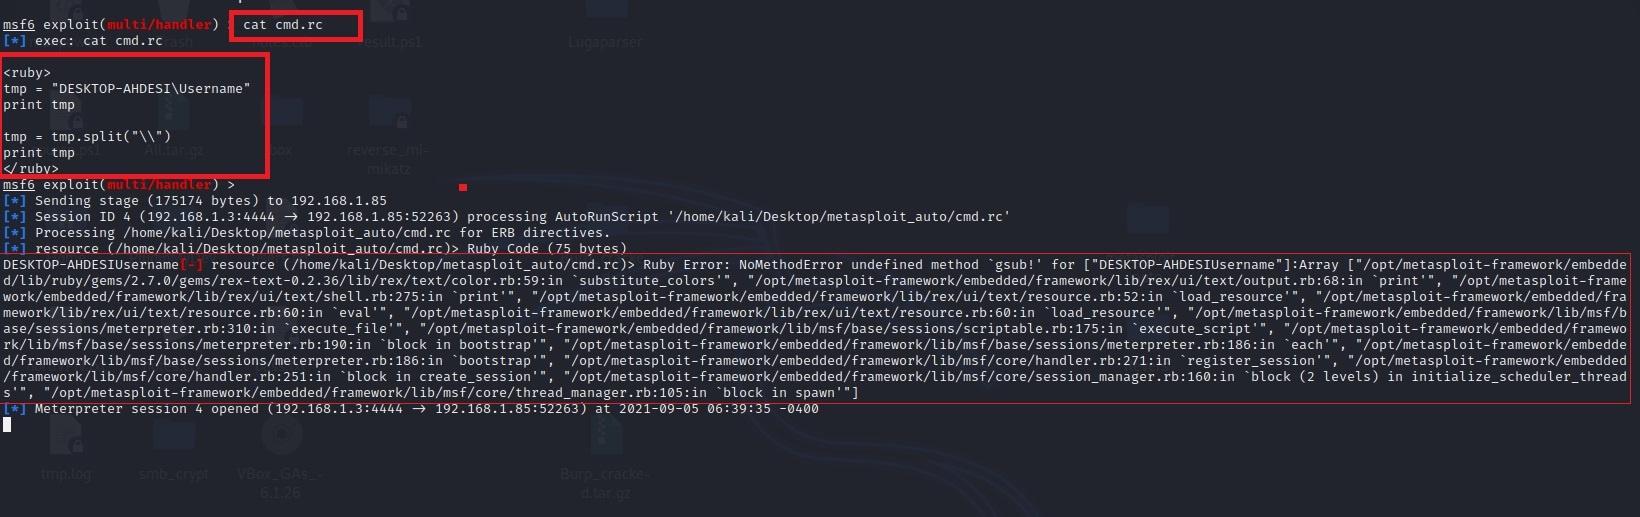 Virtual-Box-Kali-Linux-2020-3-vbox-amd64-05-09-2021-11-39-45.jpg